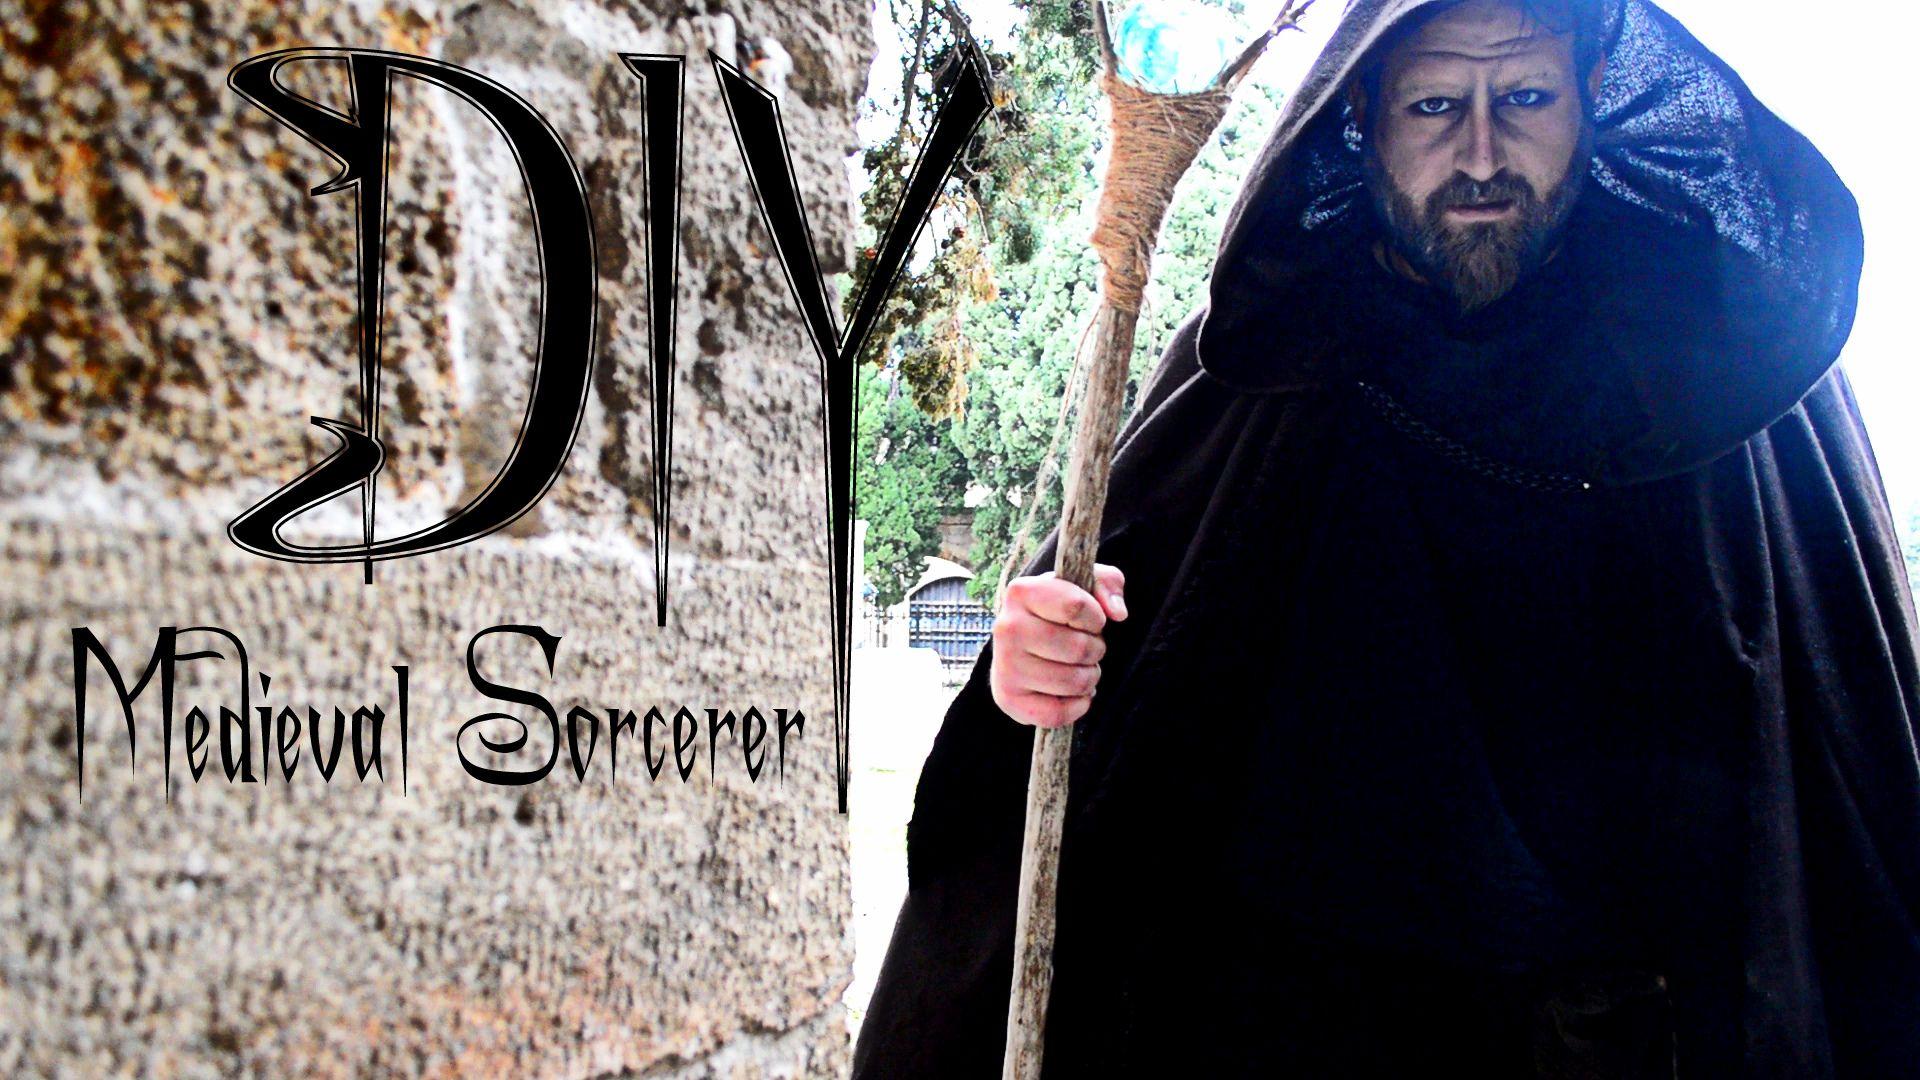 DIY Medieval style Wizard or Sorcerer or mage or necromancer ...